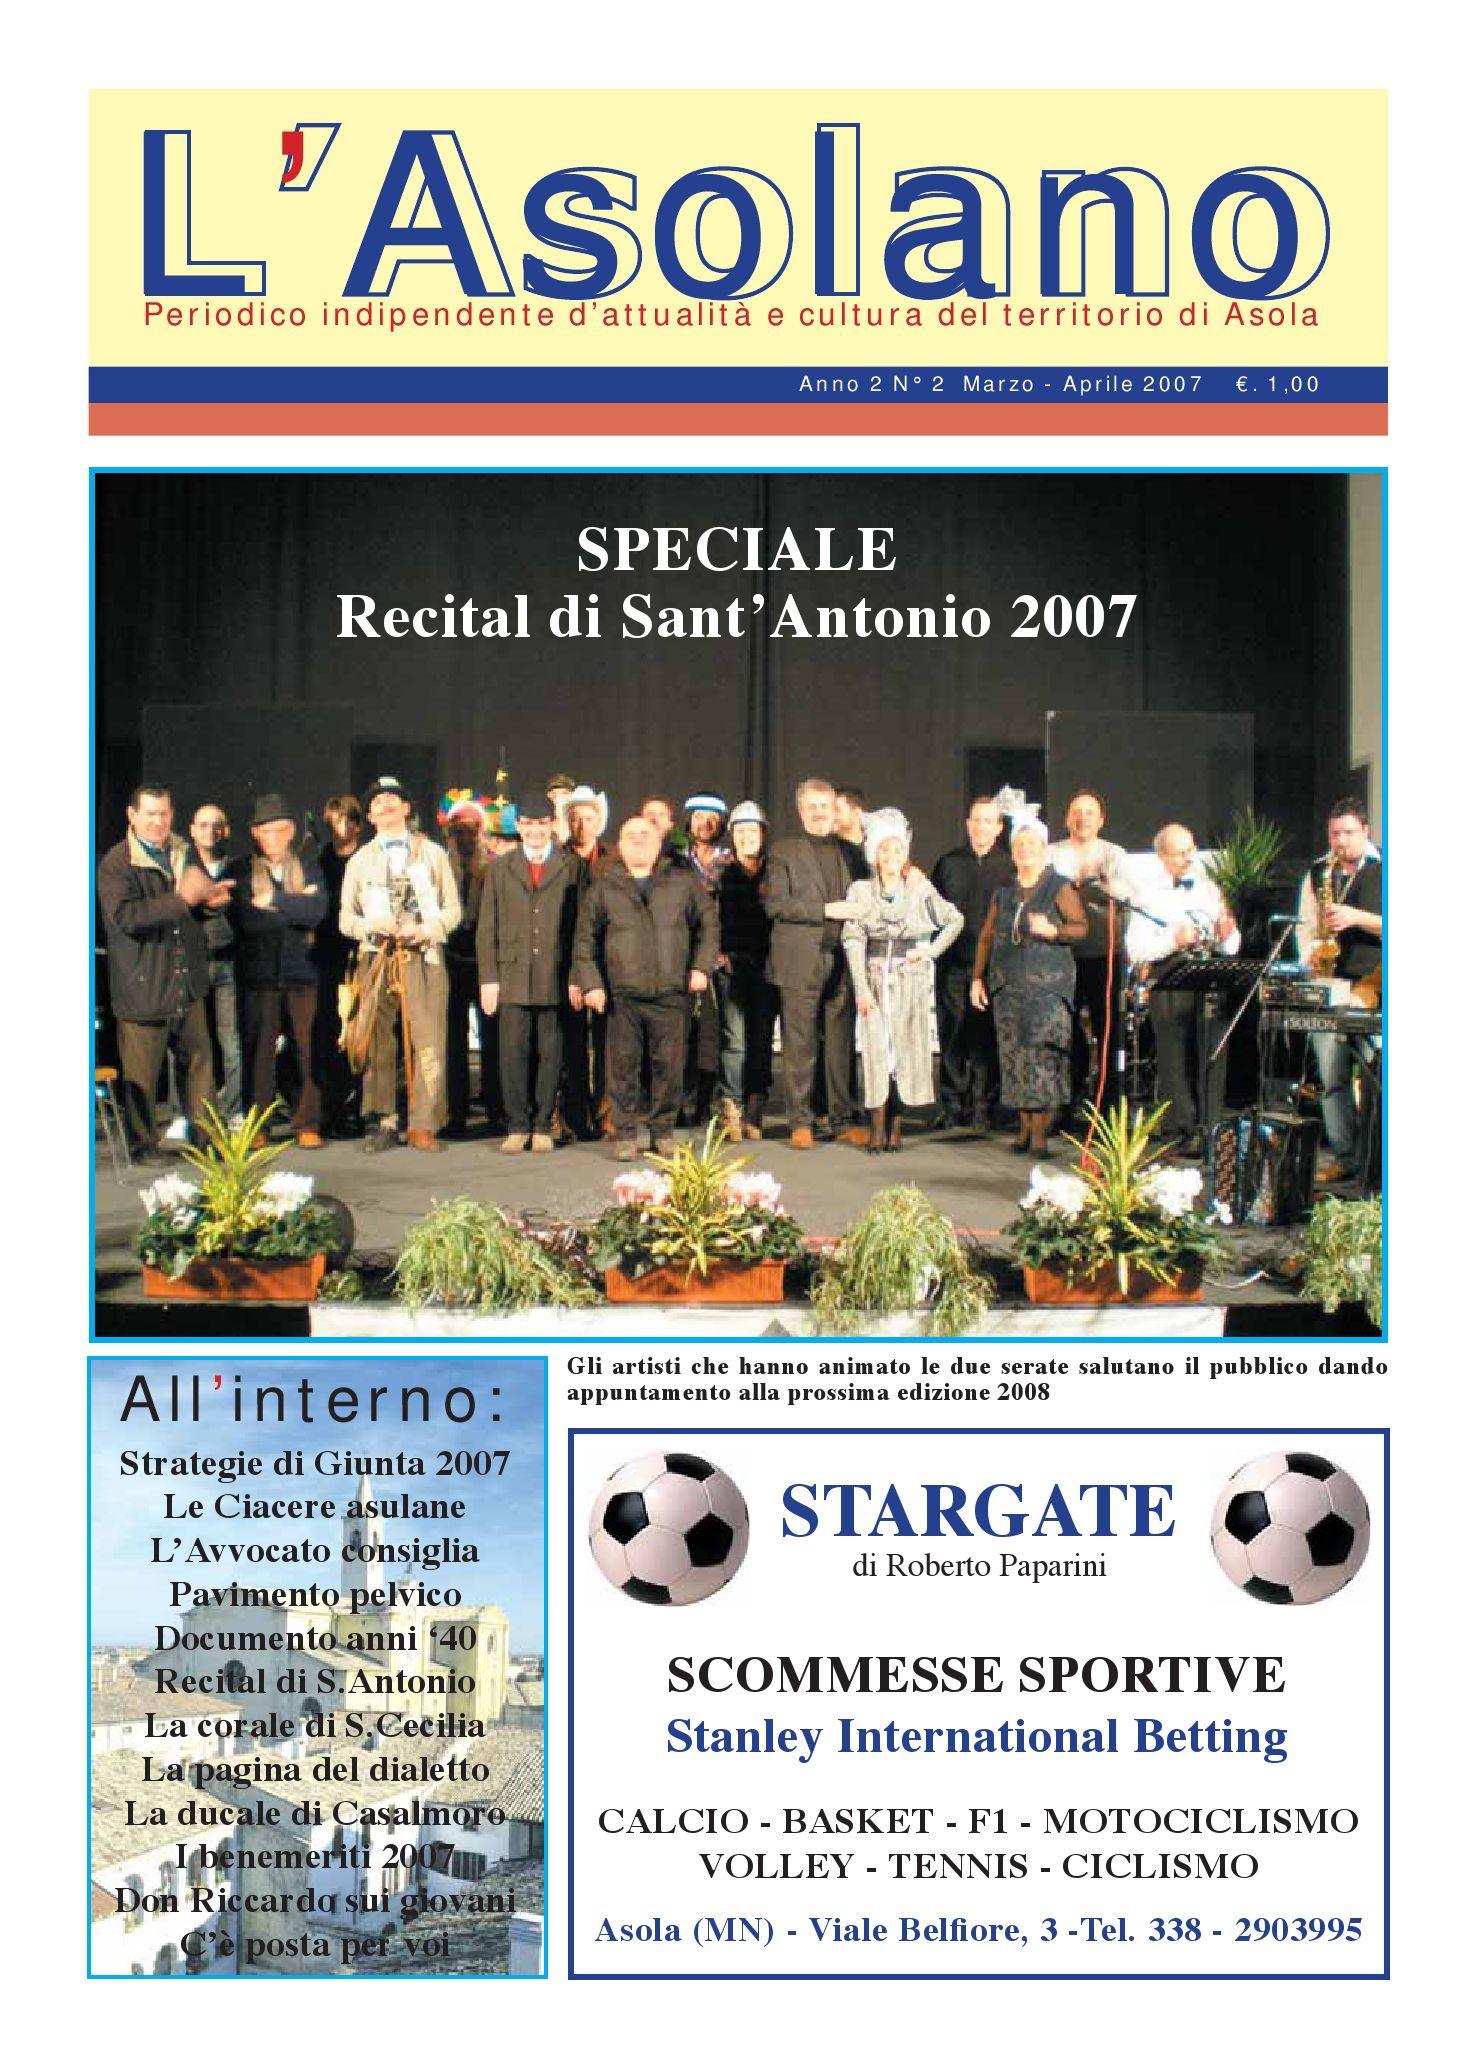 e24389caf7 L'Asolano N°2-07 by Associazione L'Asolano - issuu